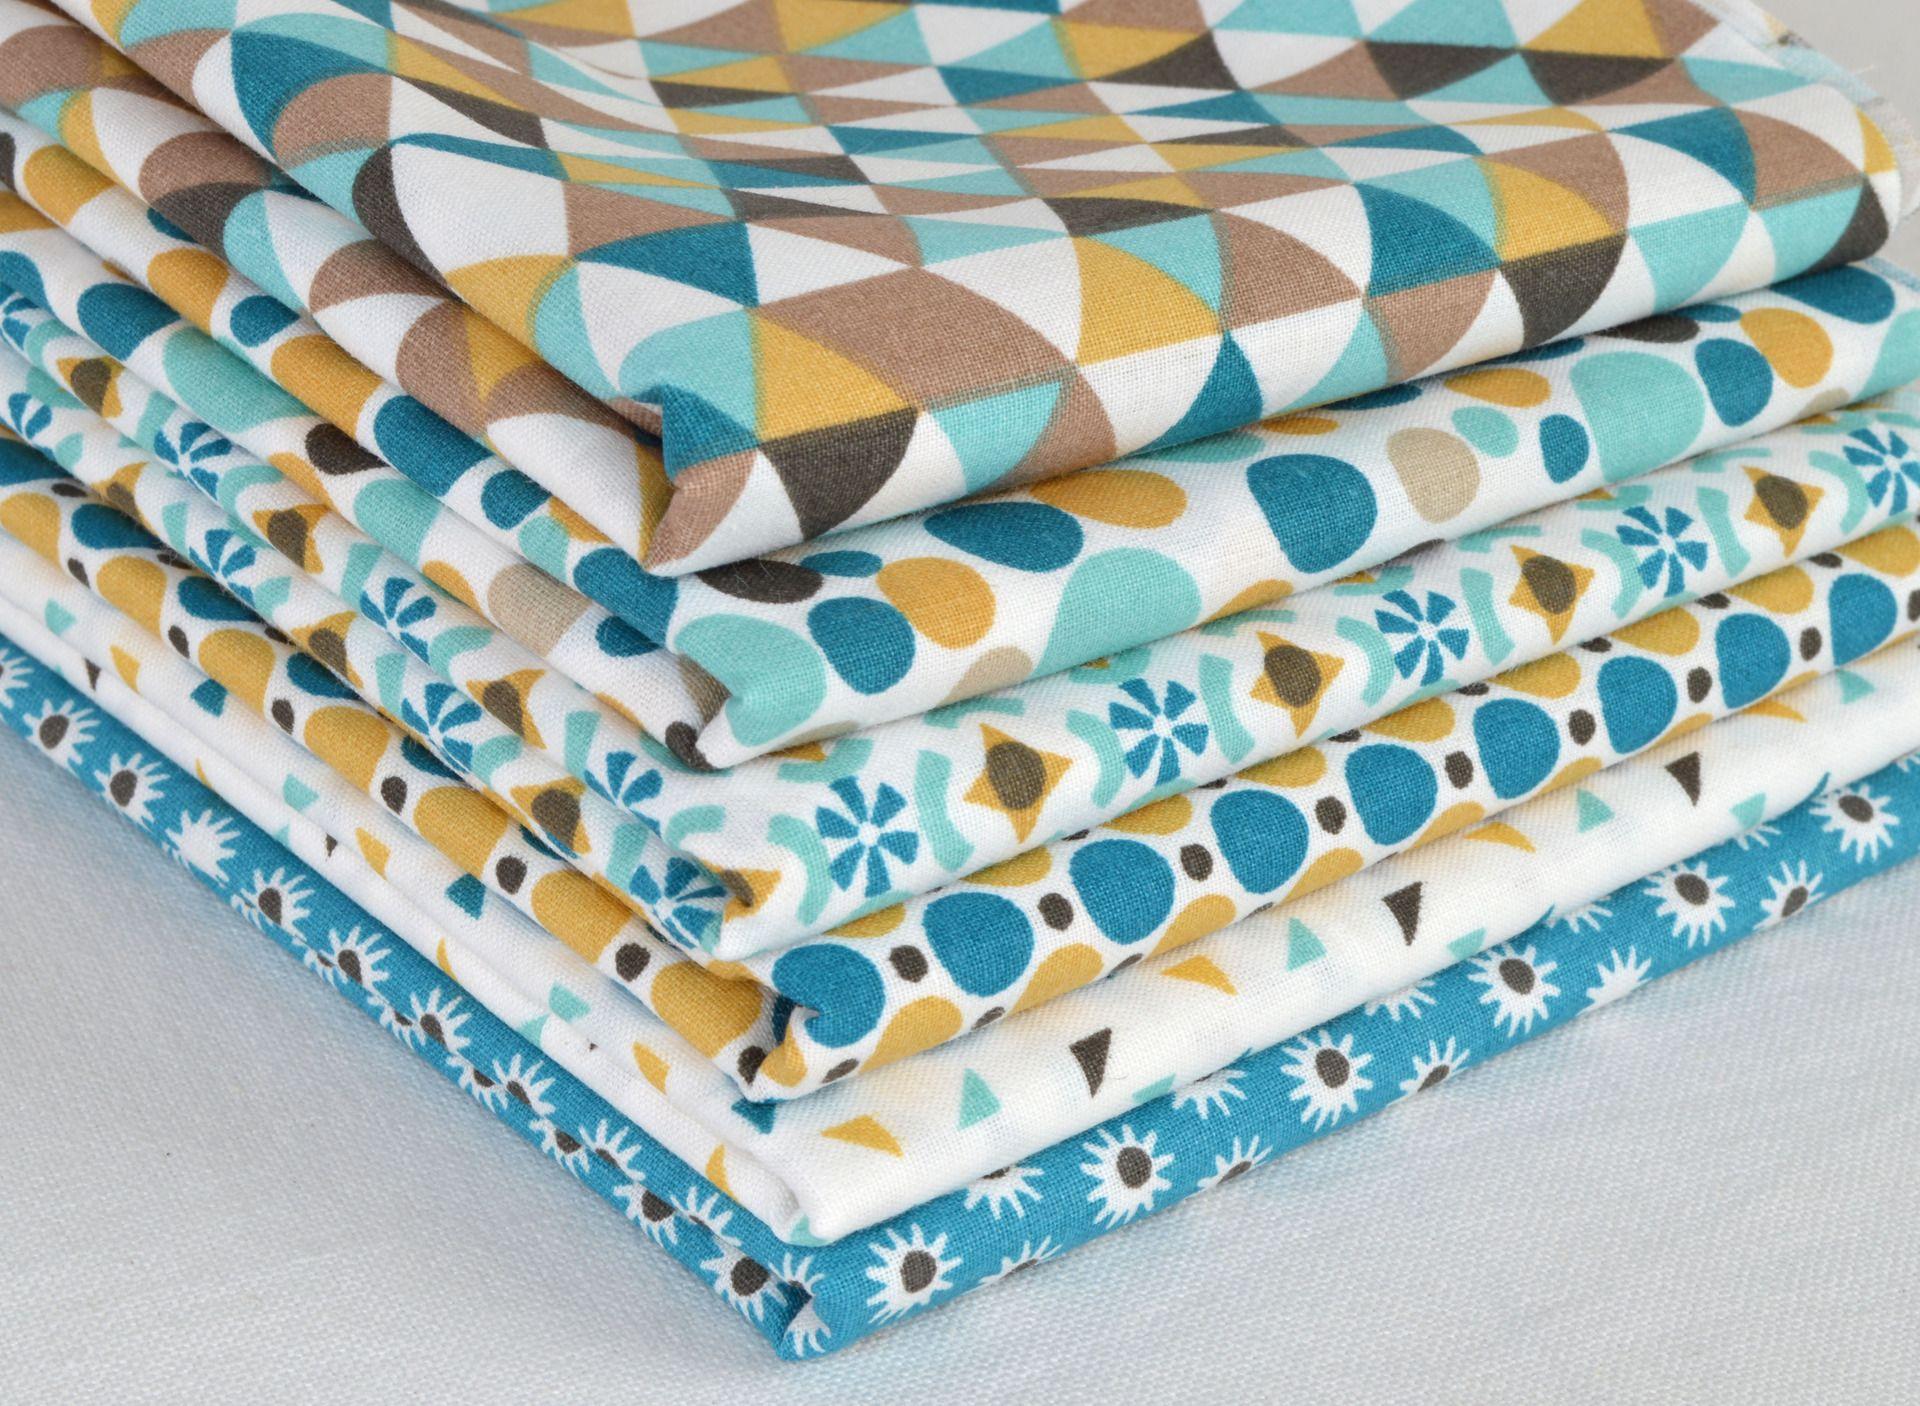 lot de 6 coupons tissu patchwork turquoise moutarde 50 x. Black Bedroom Furniture Sets. Home Design Ideas